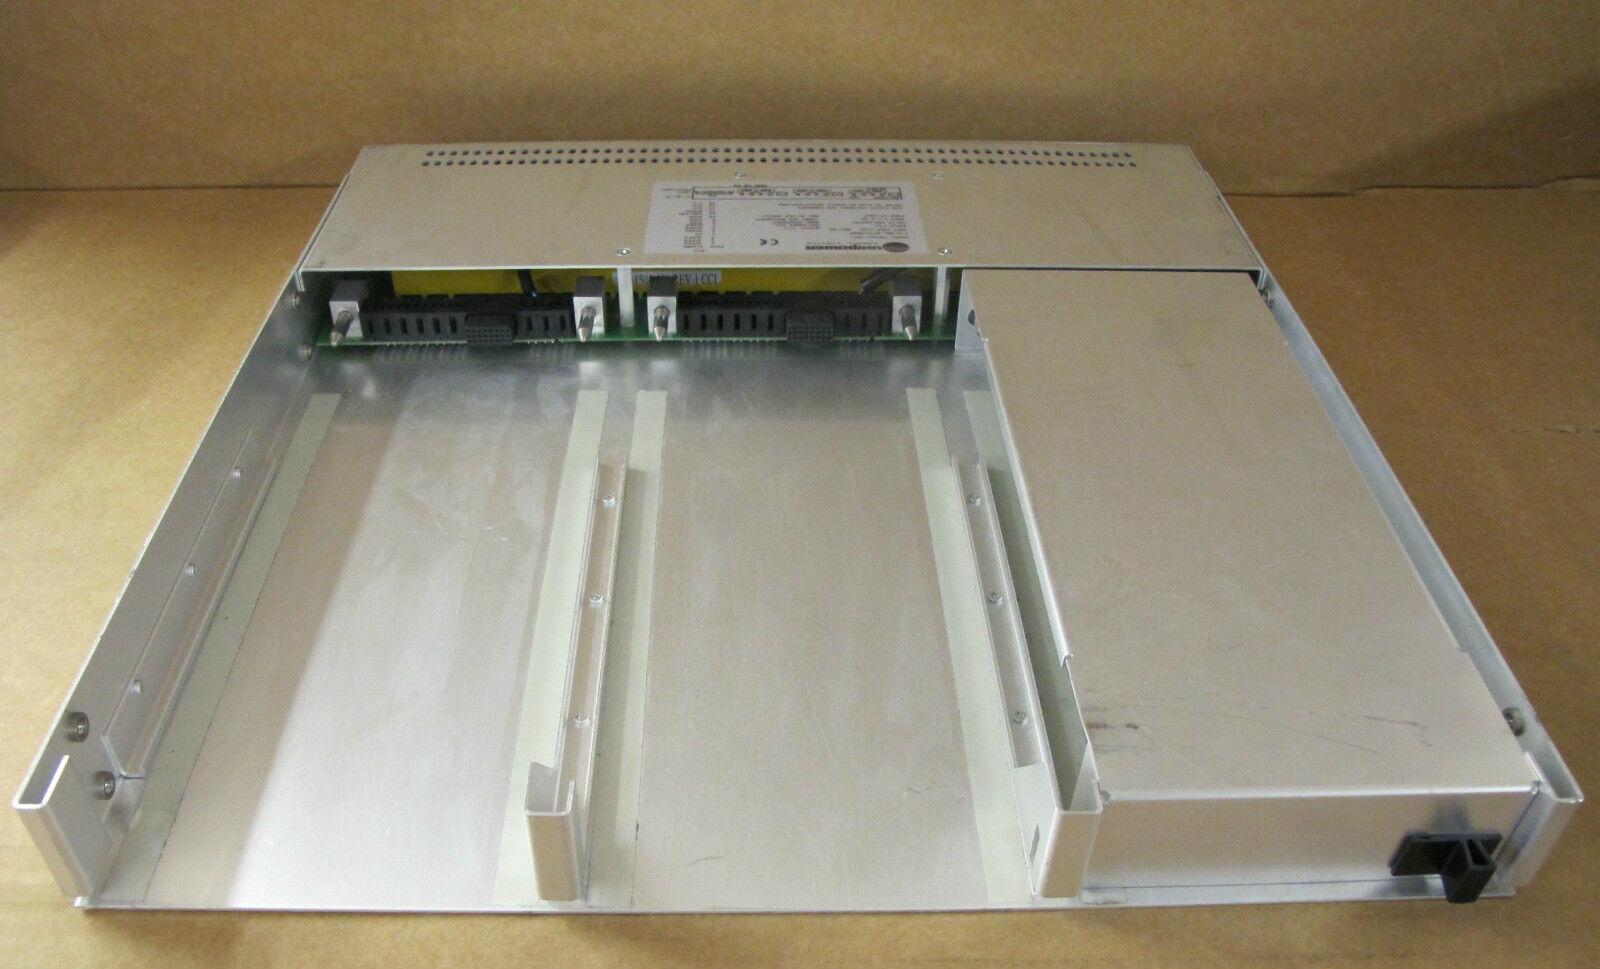 Unipower Unipower Unipower tmfr1u-1017 Chasis fuente de alimentación 001-0143-0009 100 a 240 VAC, 47 a 63 Hz b68a43